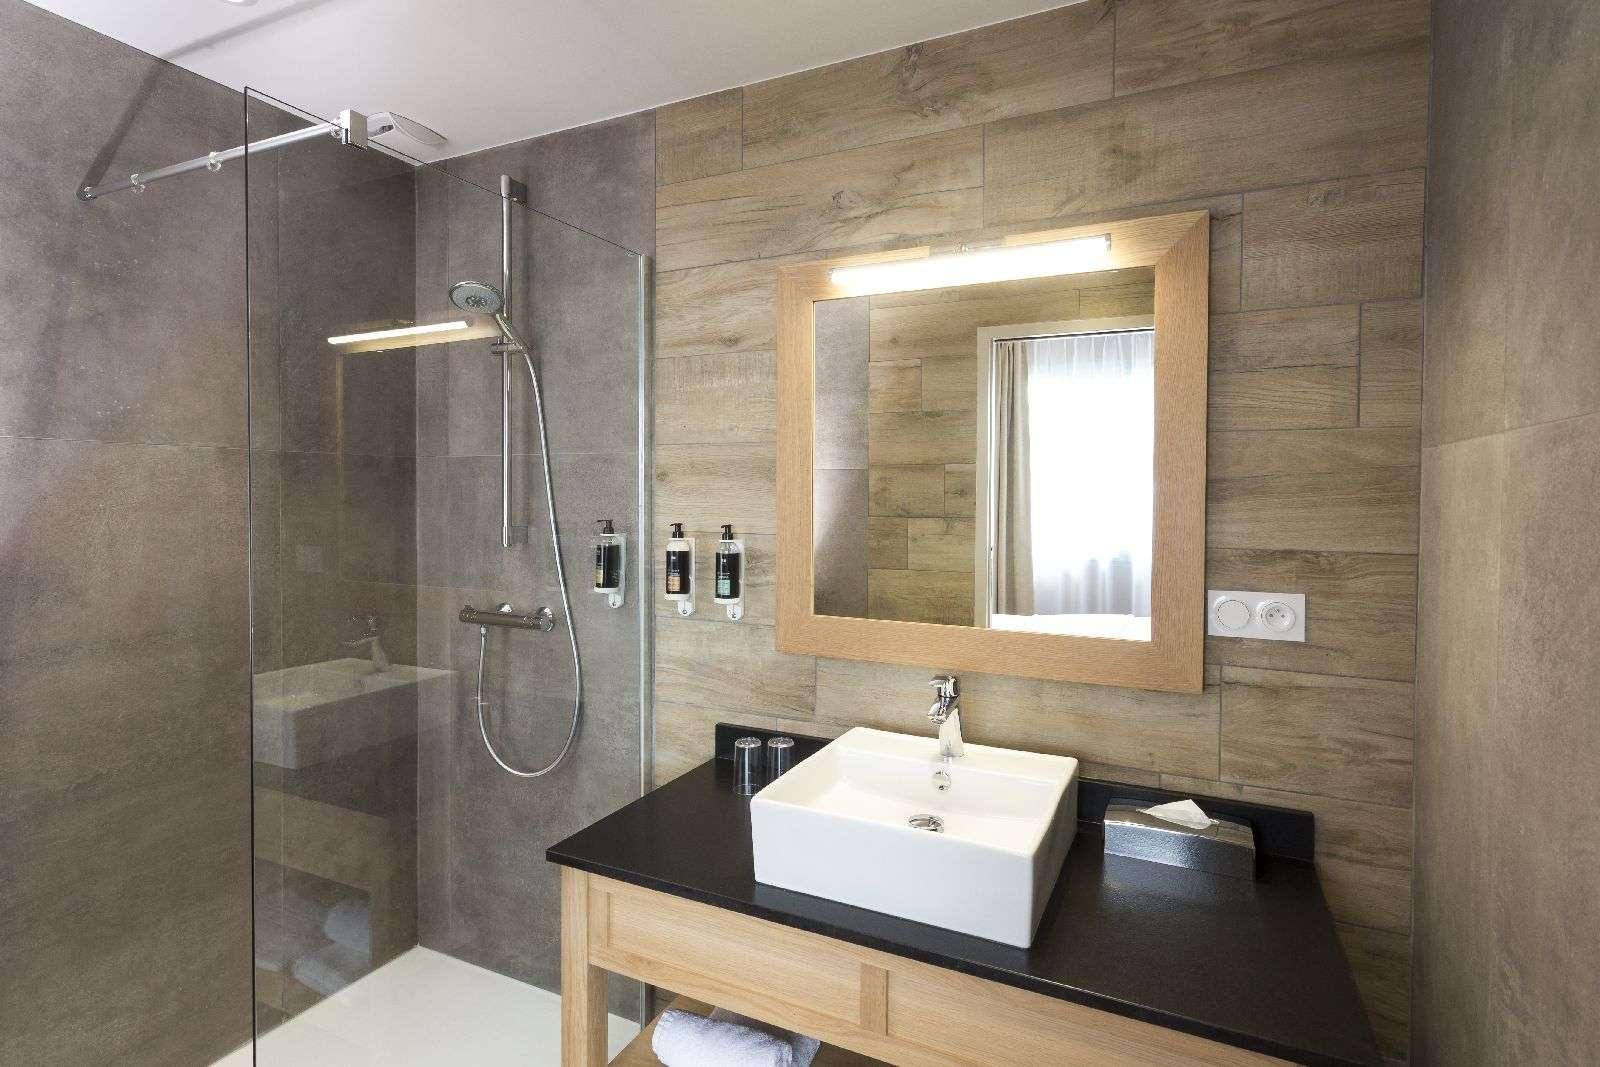 salle-de-bain_hebergement_hotel-le-tumulus_carnac